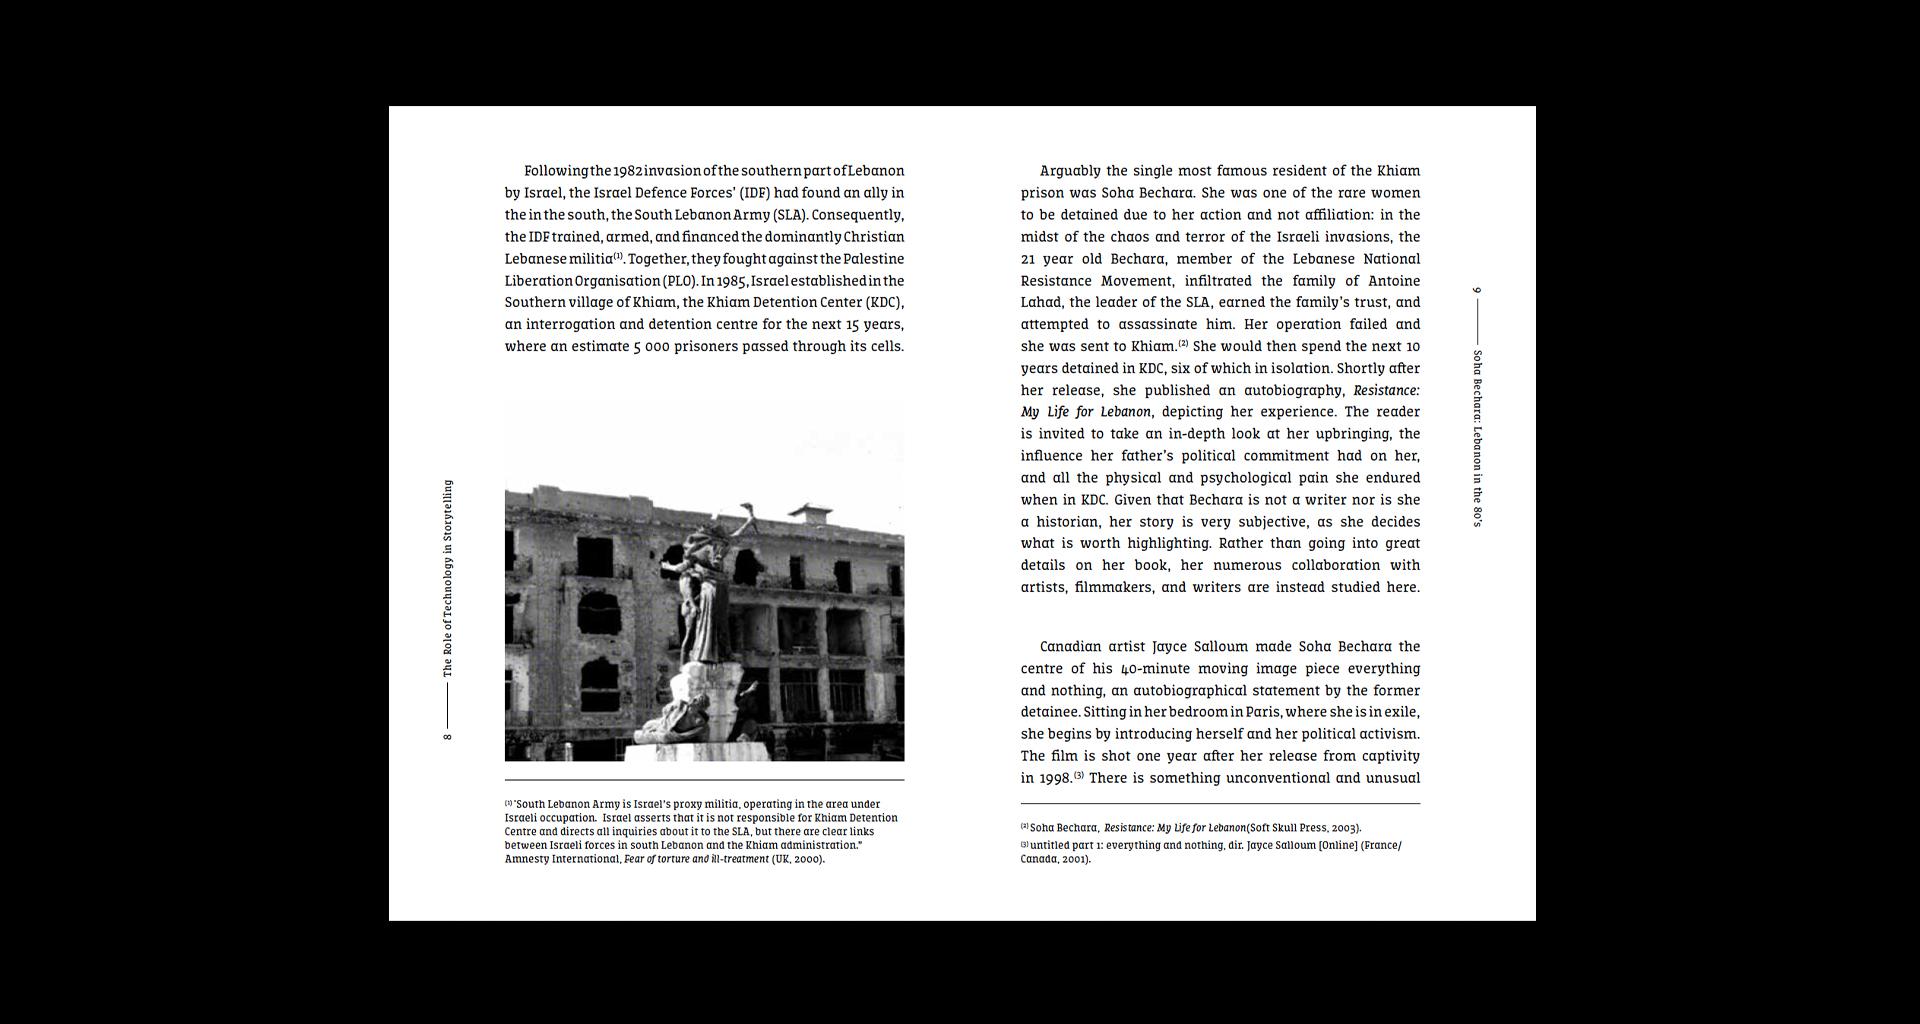 Dissertation_Photo_0012_Screenshot 2019-08-19 at 13.38.06.jpg